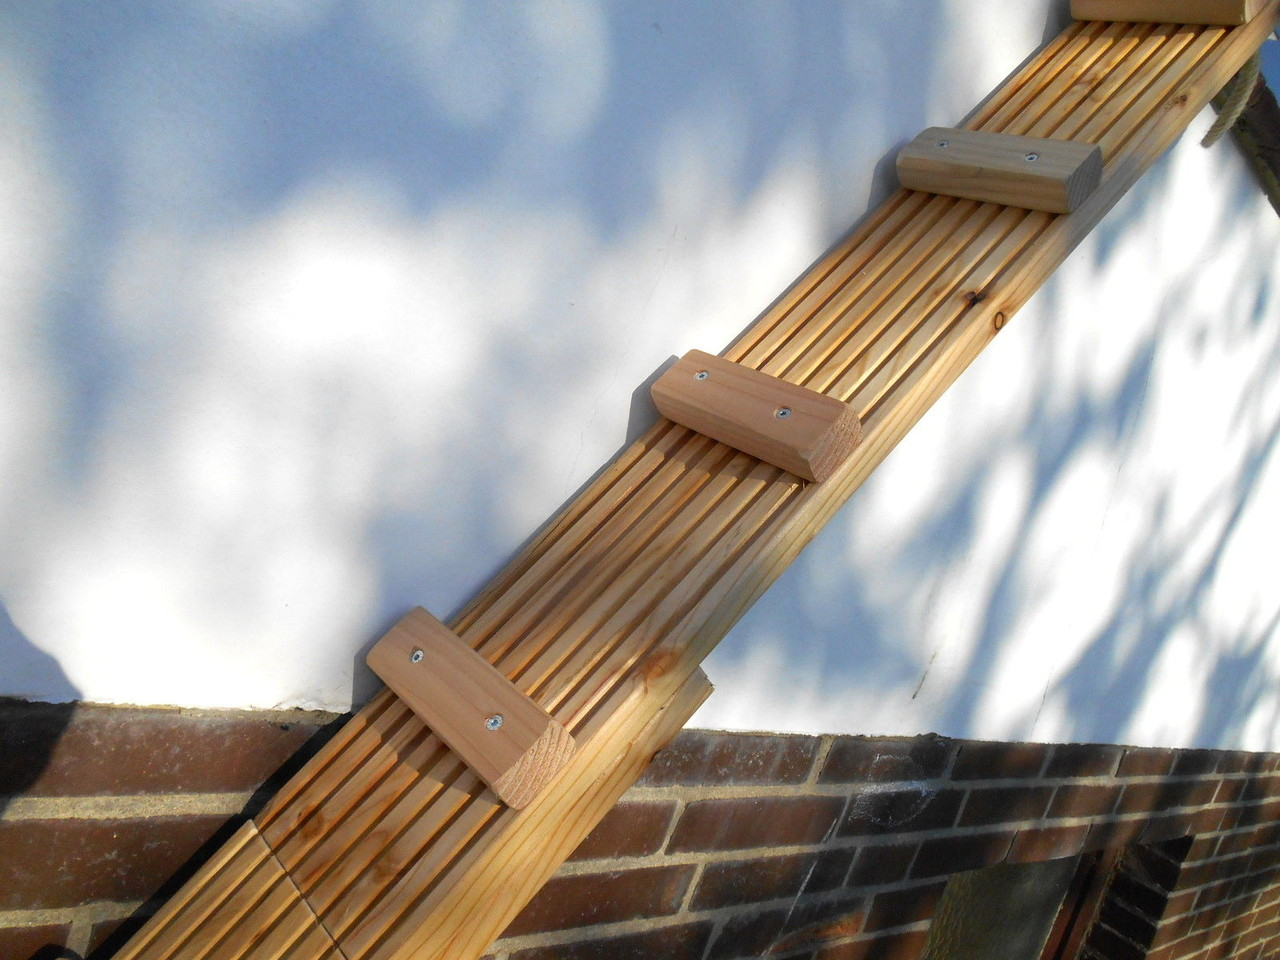 katzentreppe katzenleiter balkon kaufen jennys echte handarbeit. Black Bedroom Furniture Sets. Home Design Ideas